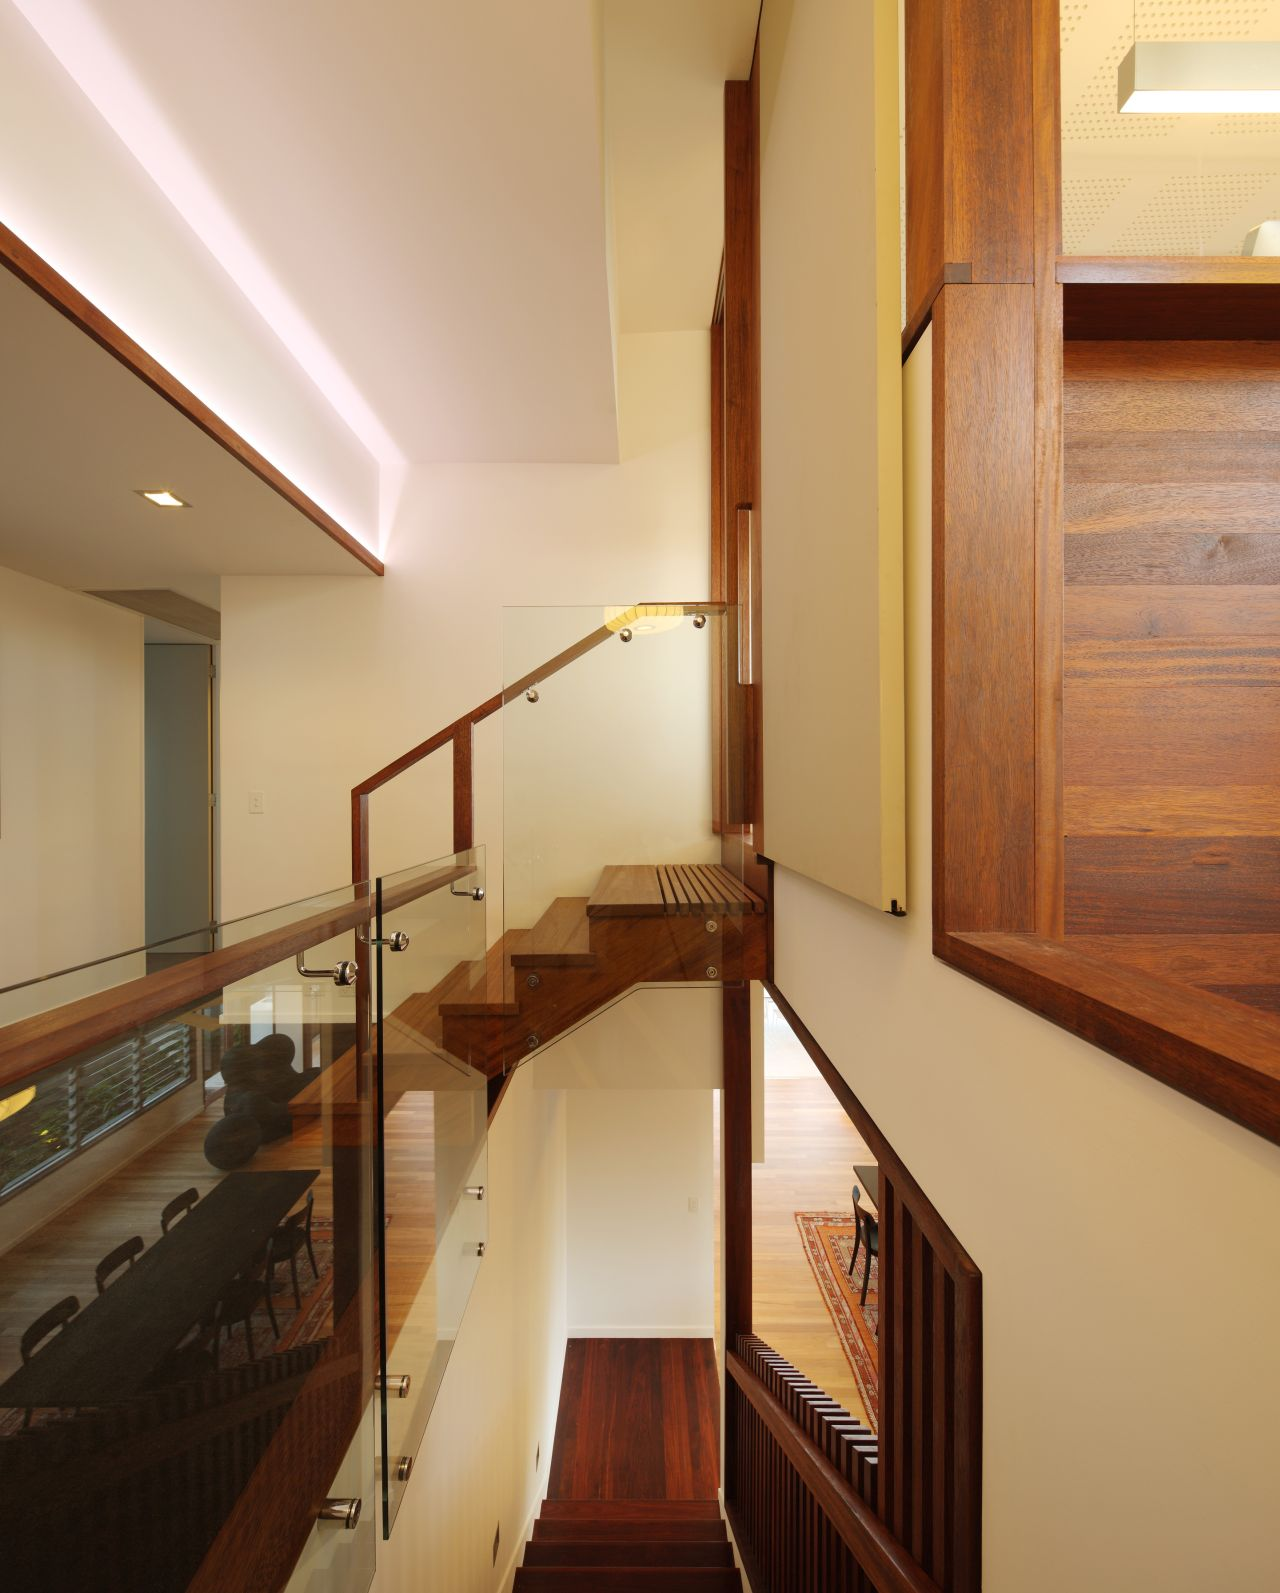 Park House / Shaun Lockyer Architects